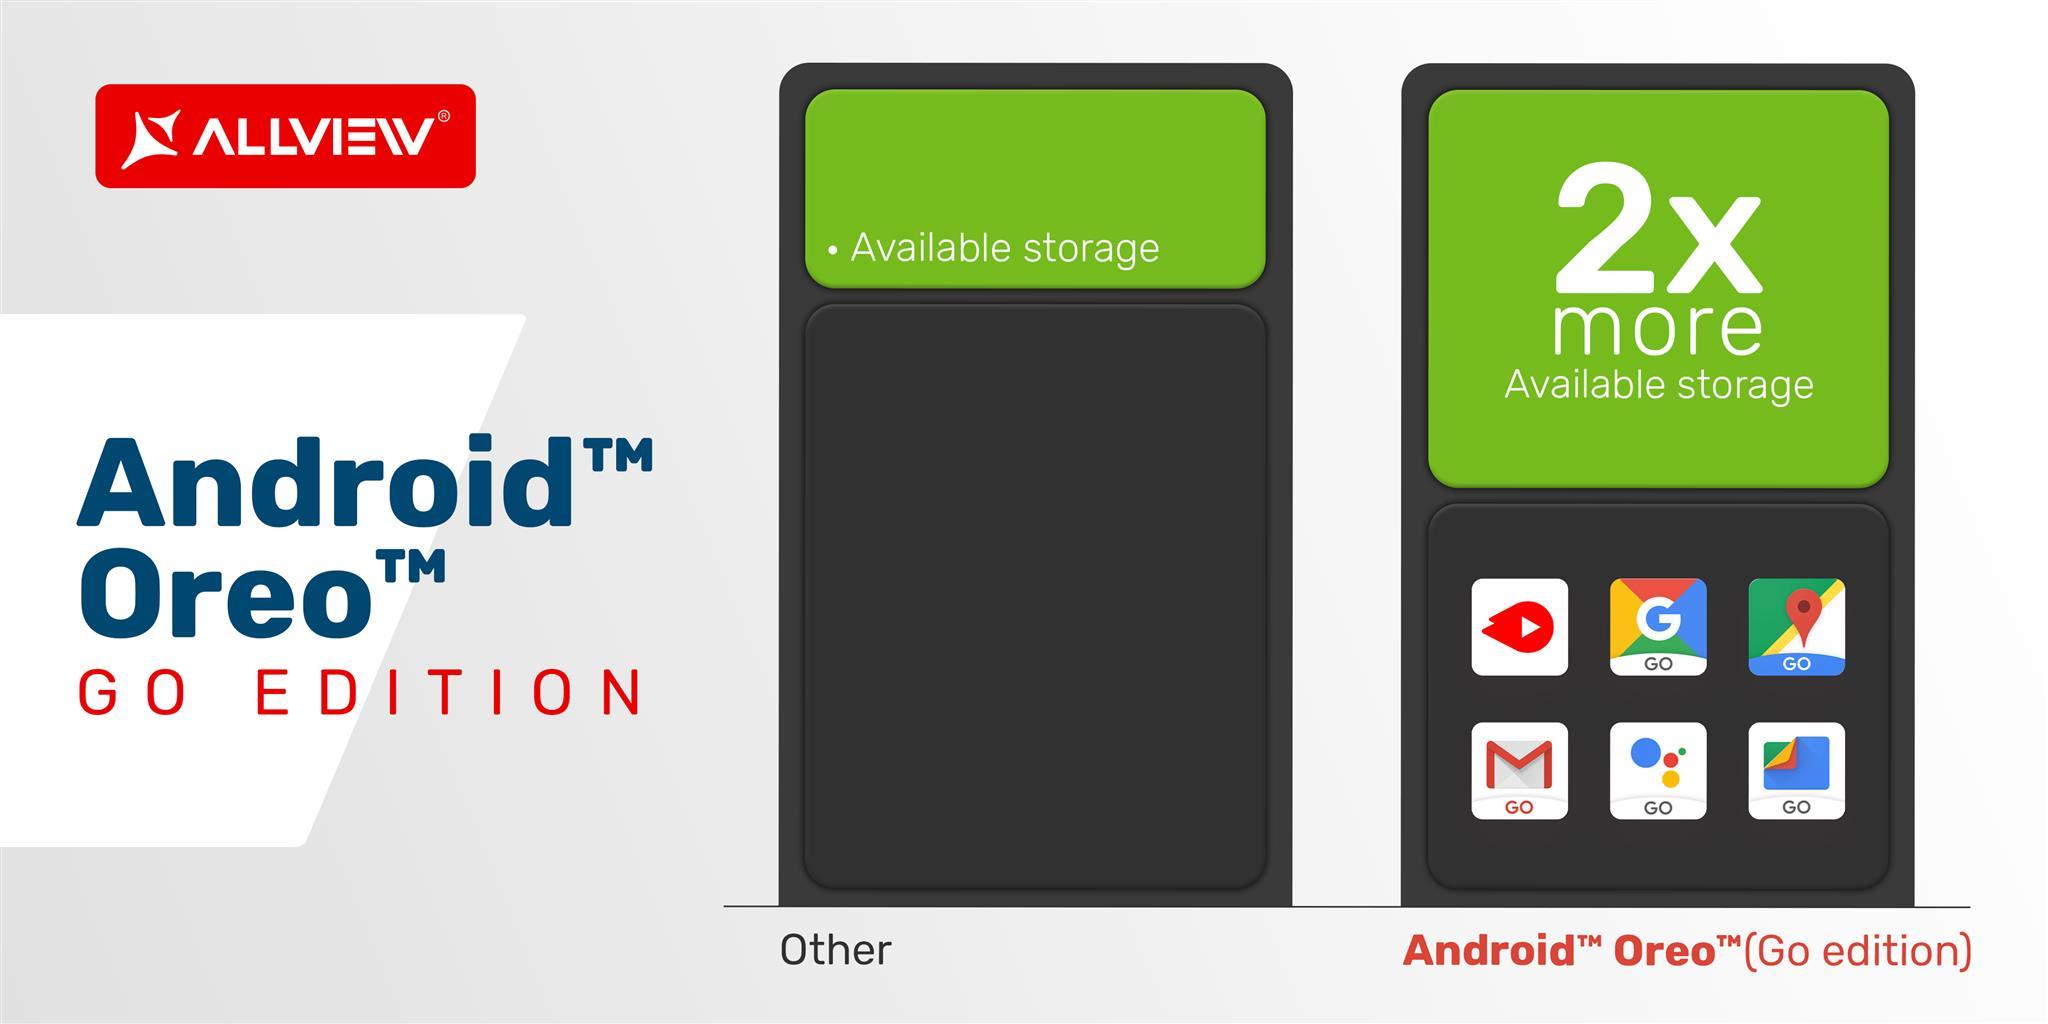 Primul Allview cu Android Go